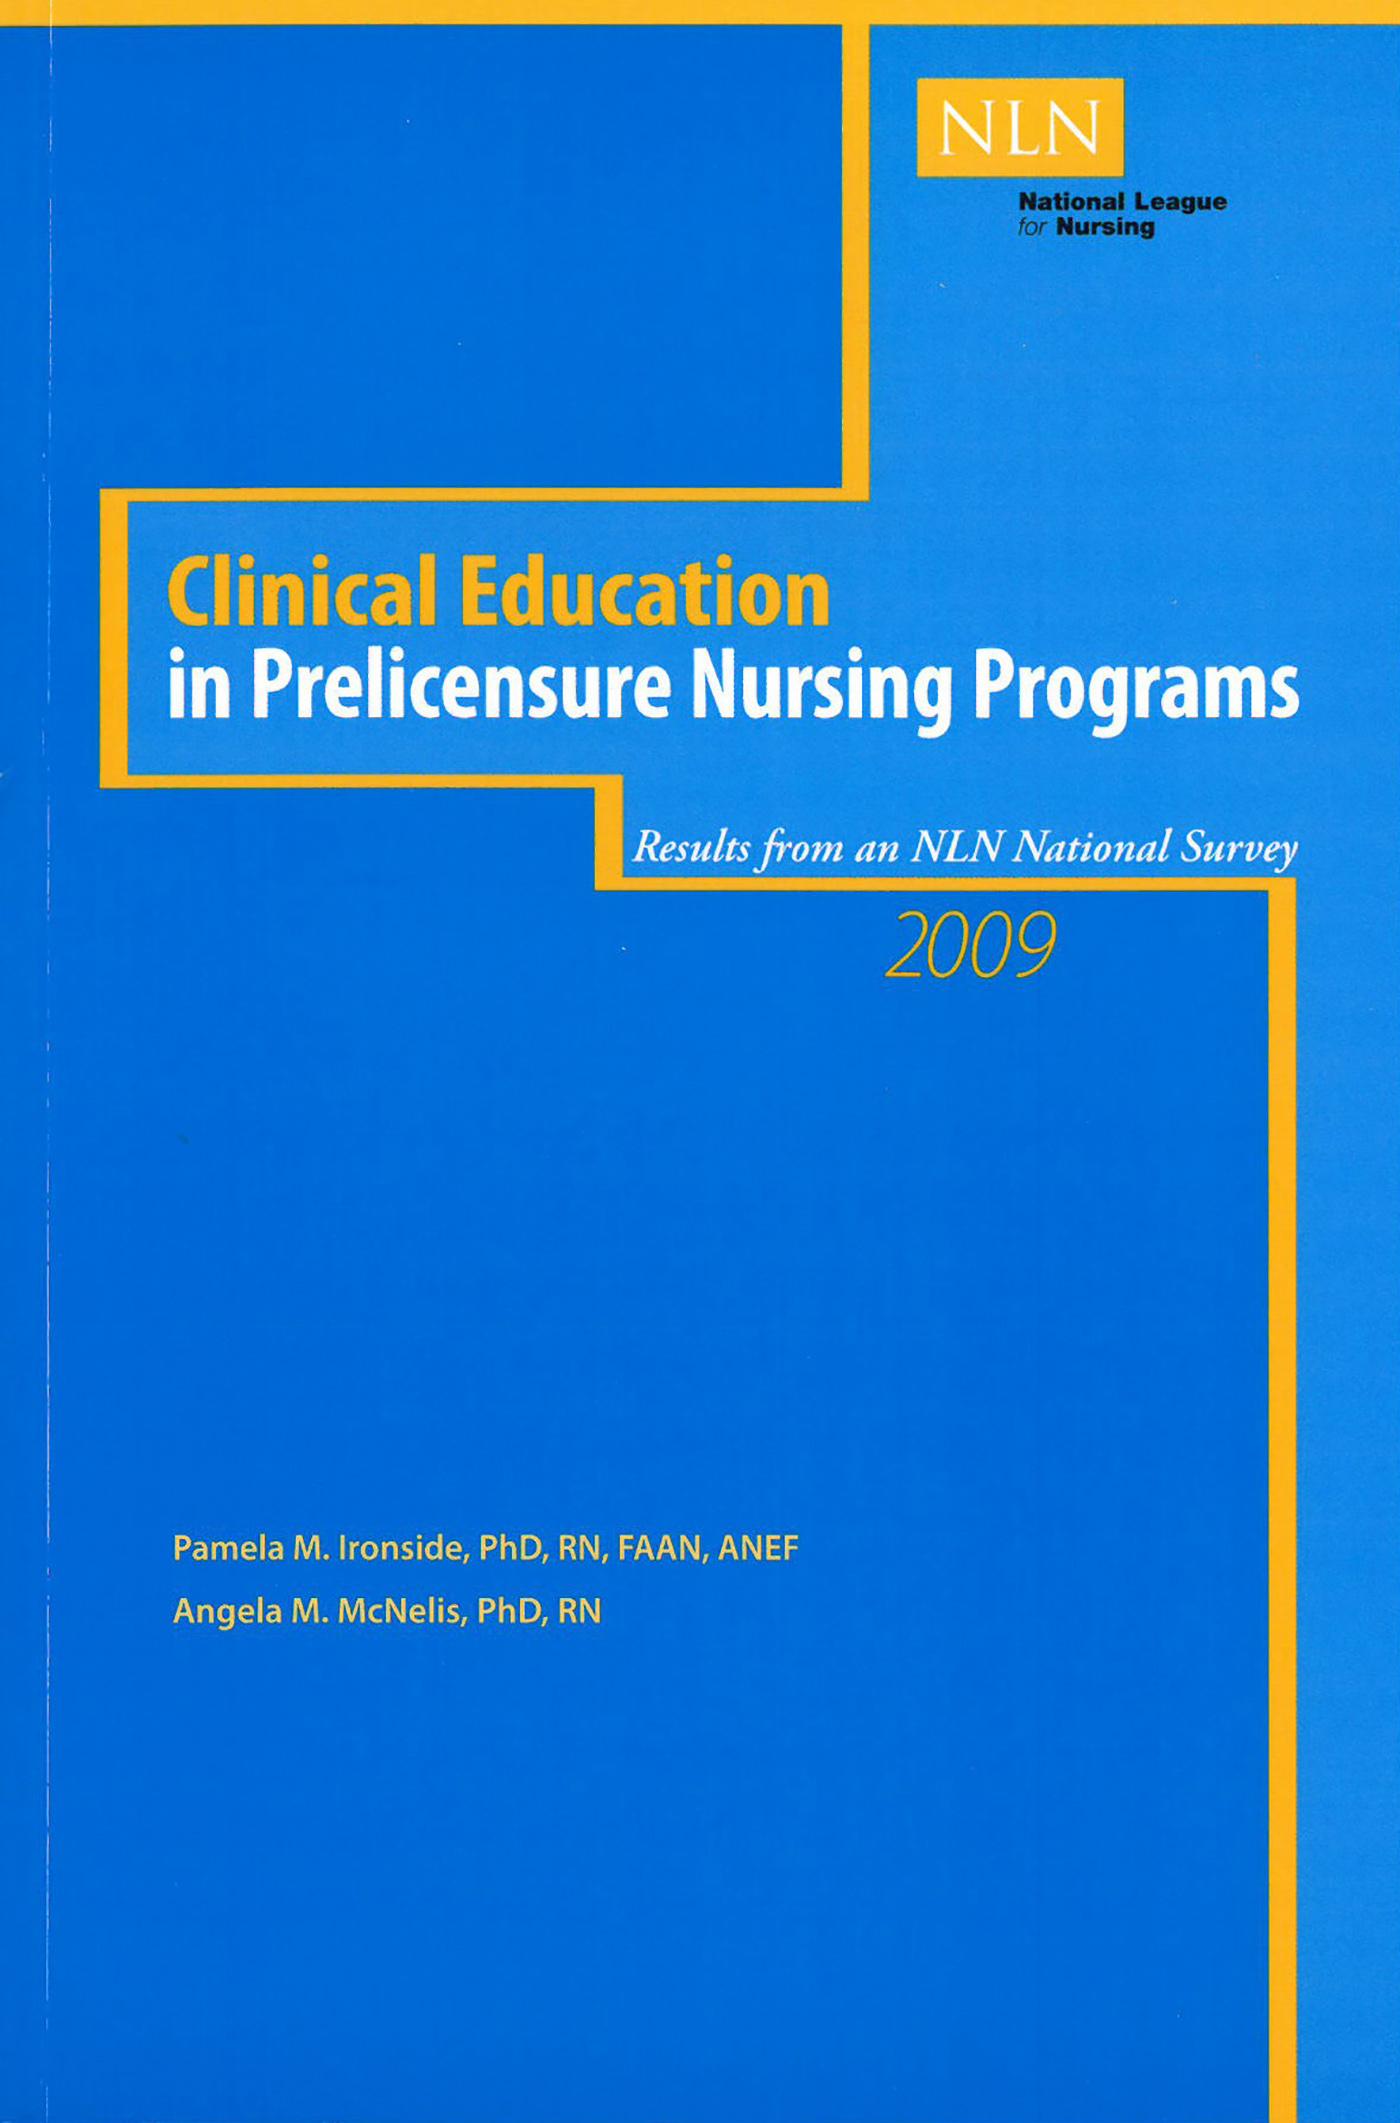 Clinical Education in Prelicensure Nursing Programs